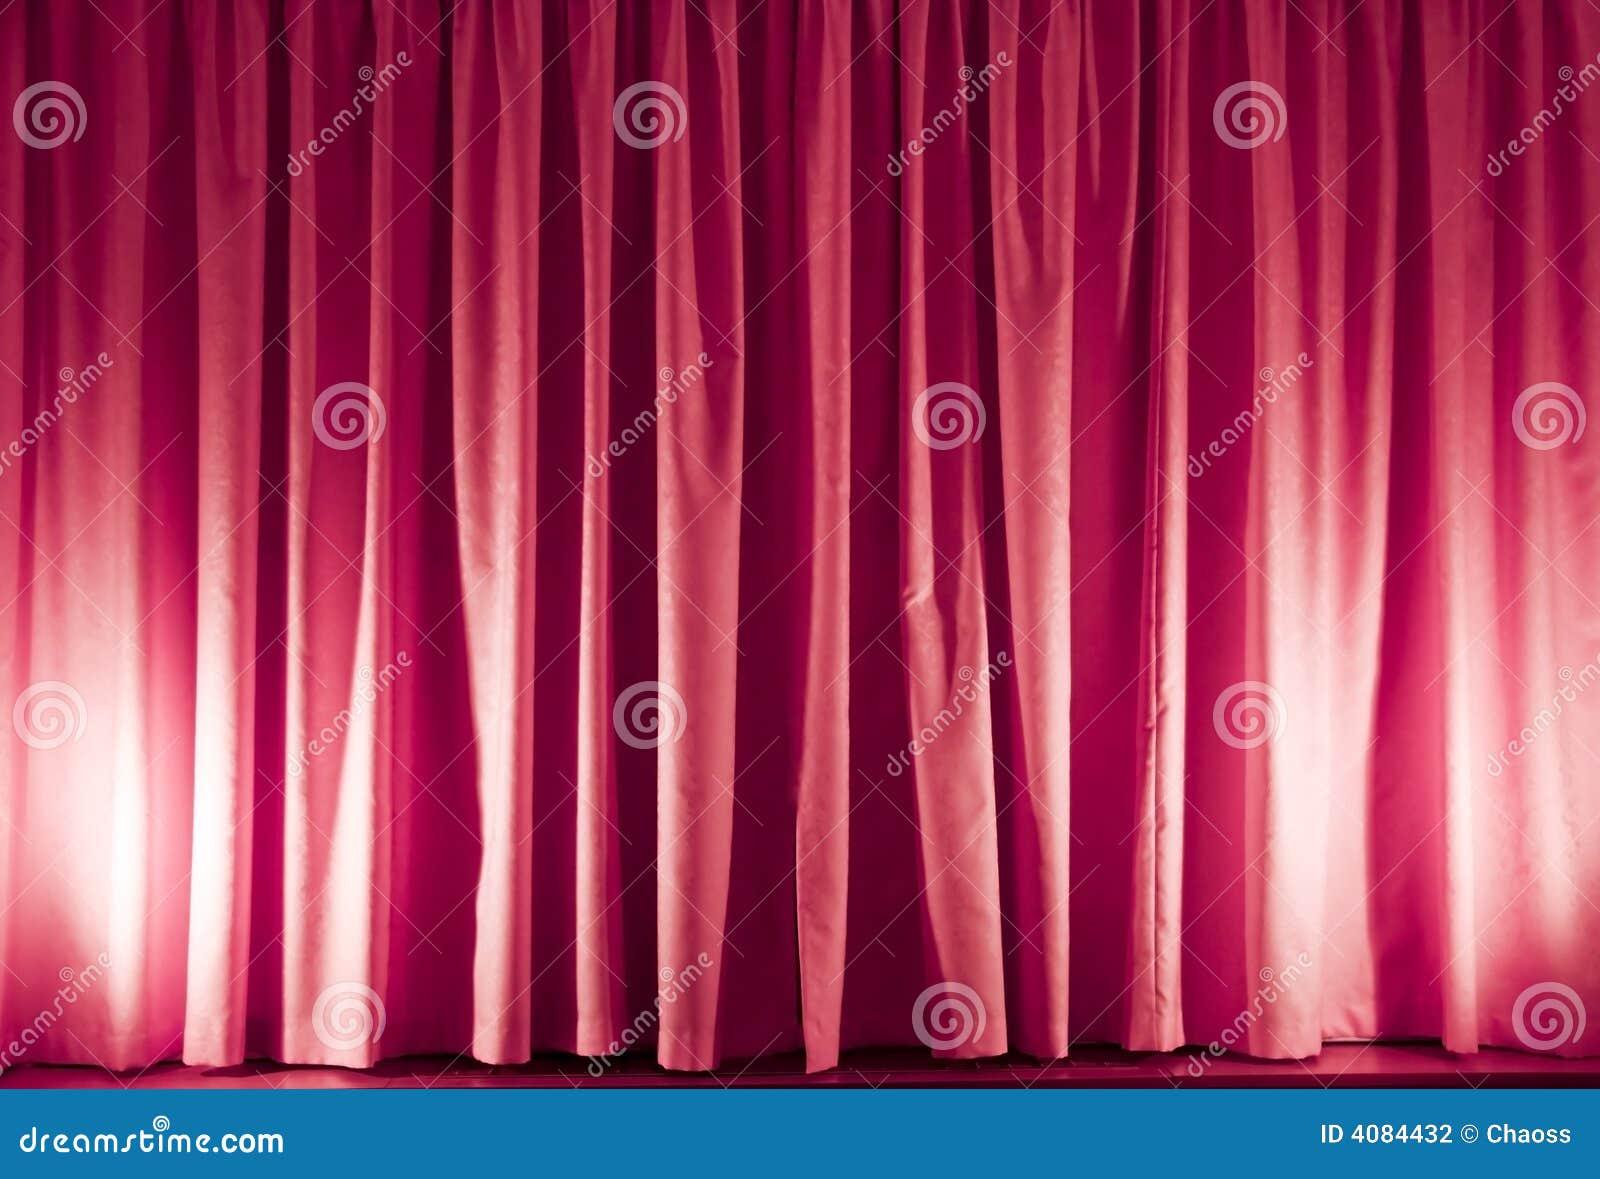 rideaux chambre fille rose. Black Bedroom Furniture Sets. Home Design Ideas